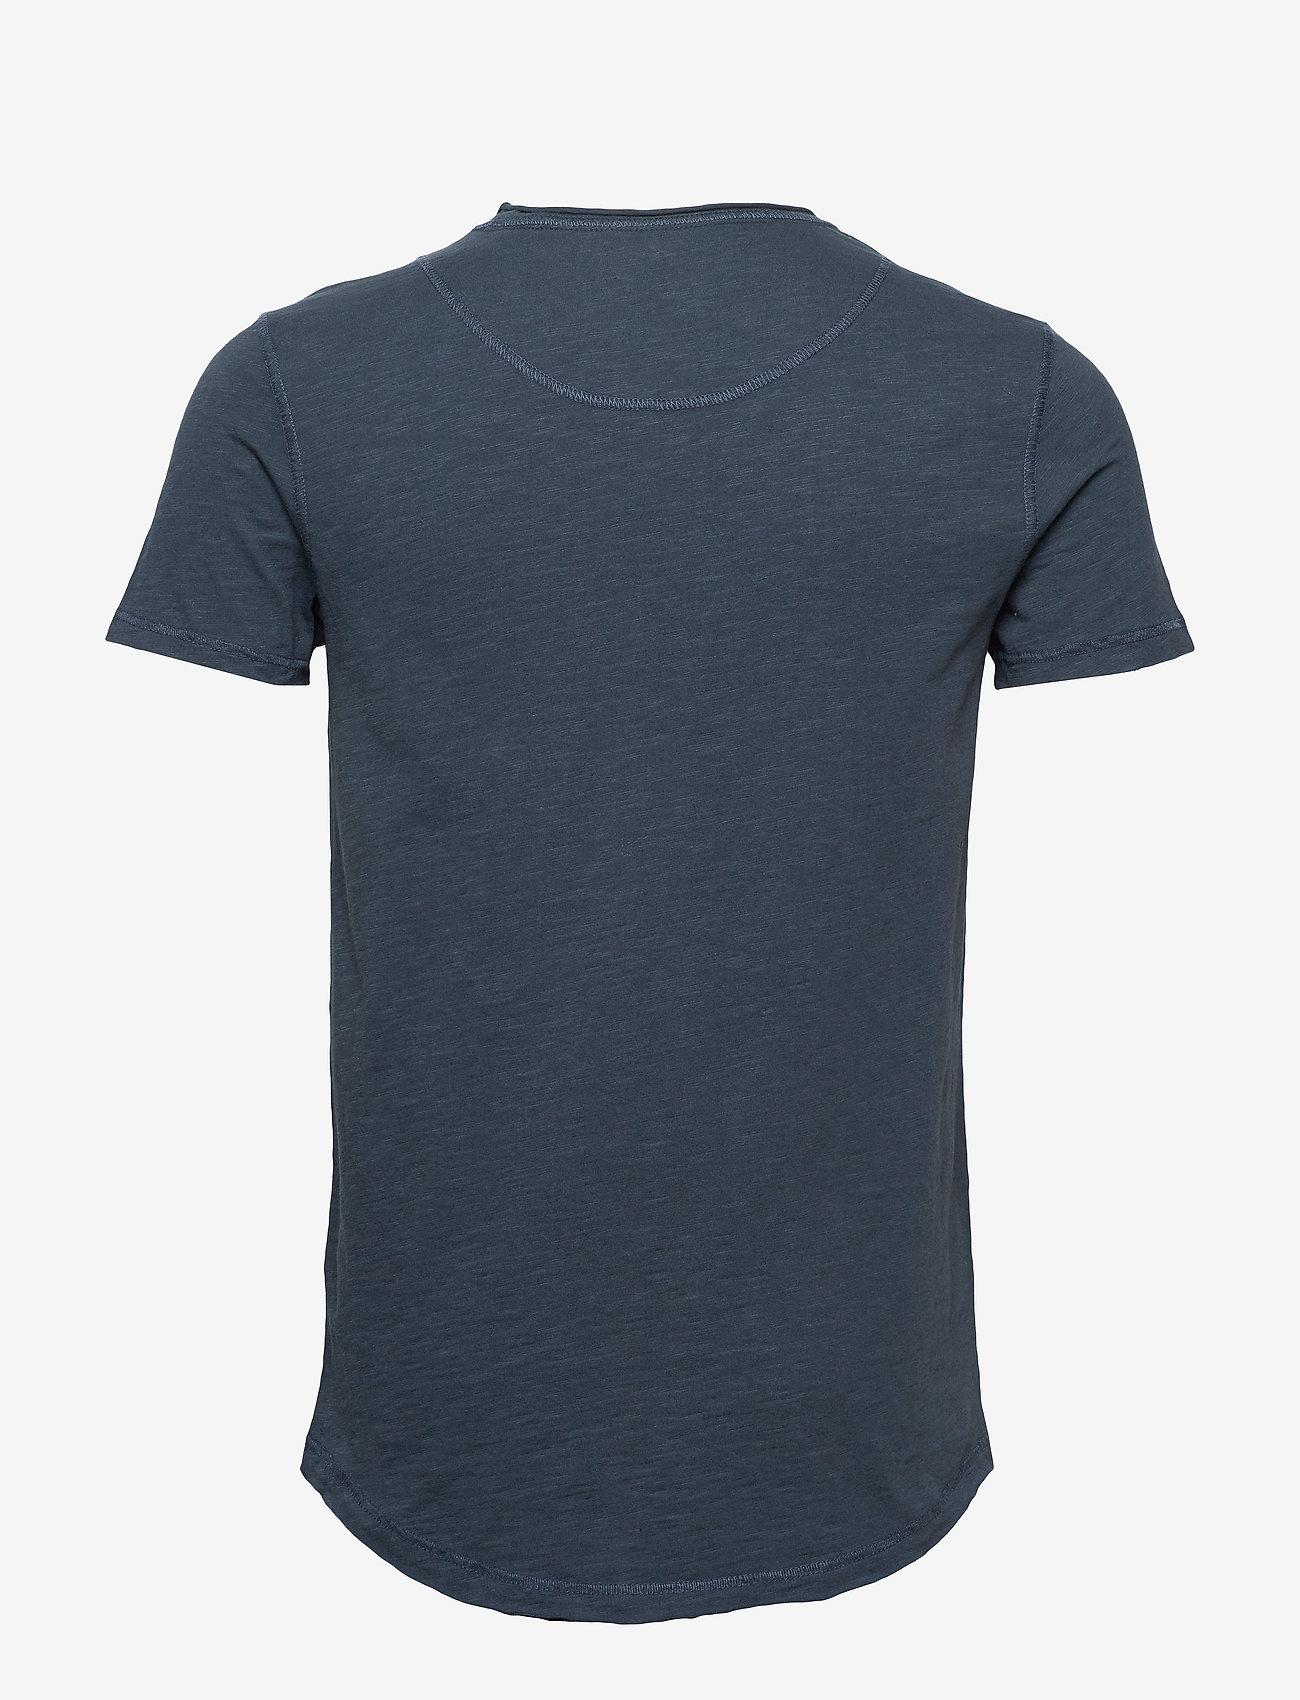 Gabba Konrad Slub S/S Tee - T-skjorter NAVY - Menn Klær